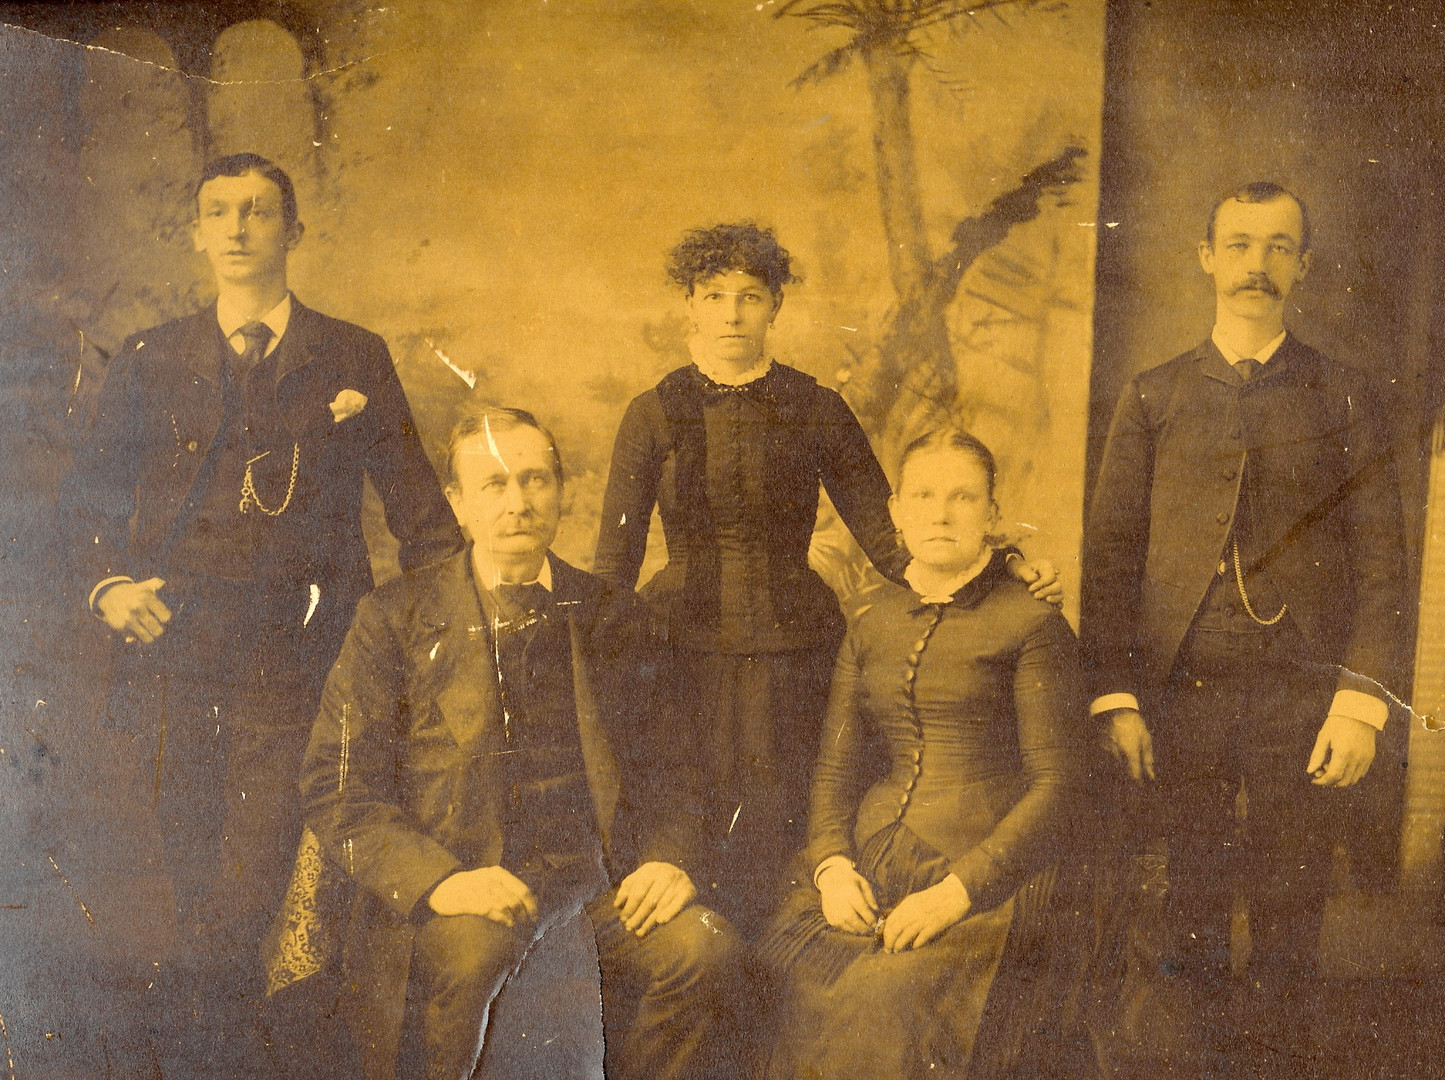 John and Elizabeth Dickinson family portrait